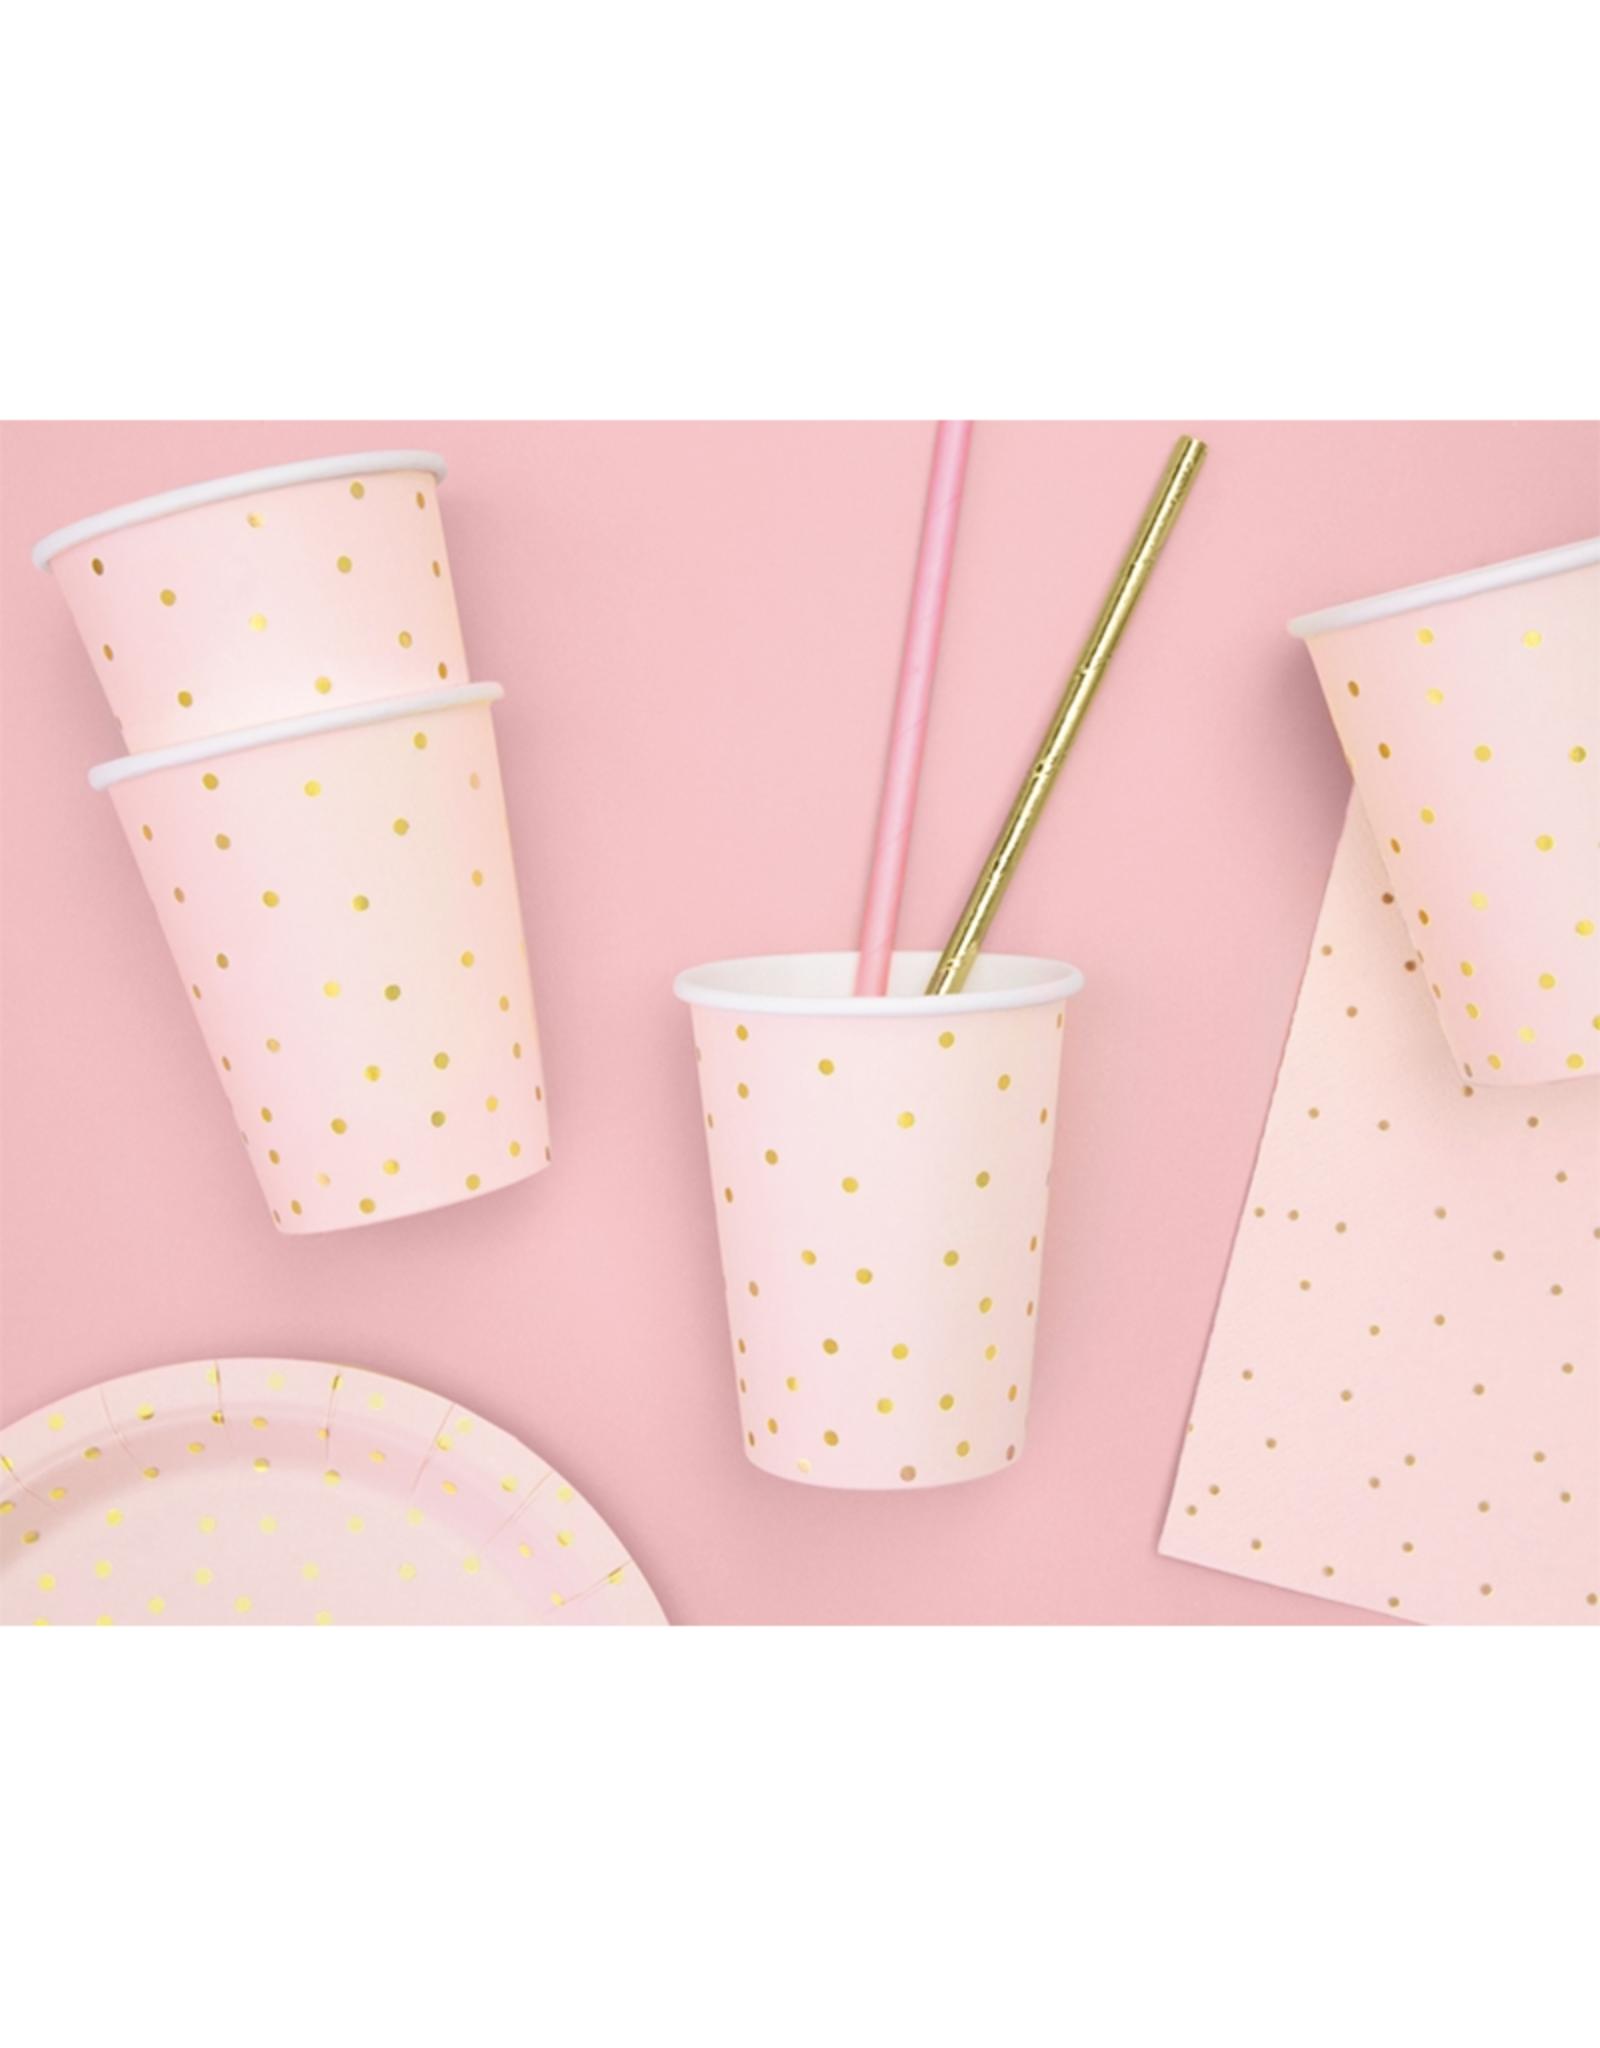 PartyDeco Servetten roze & gouden glitter | 20 stuks